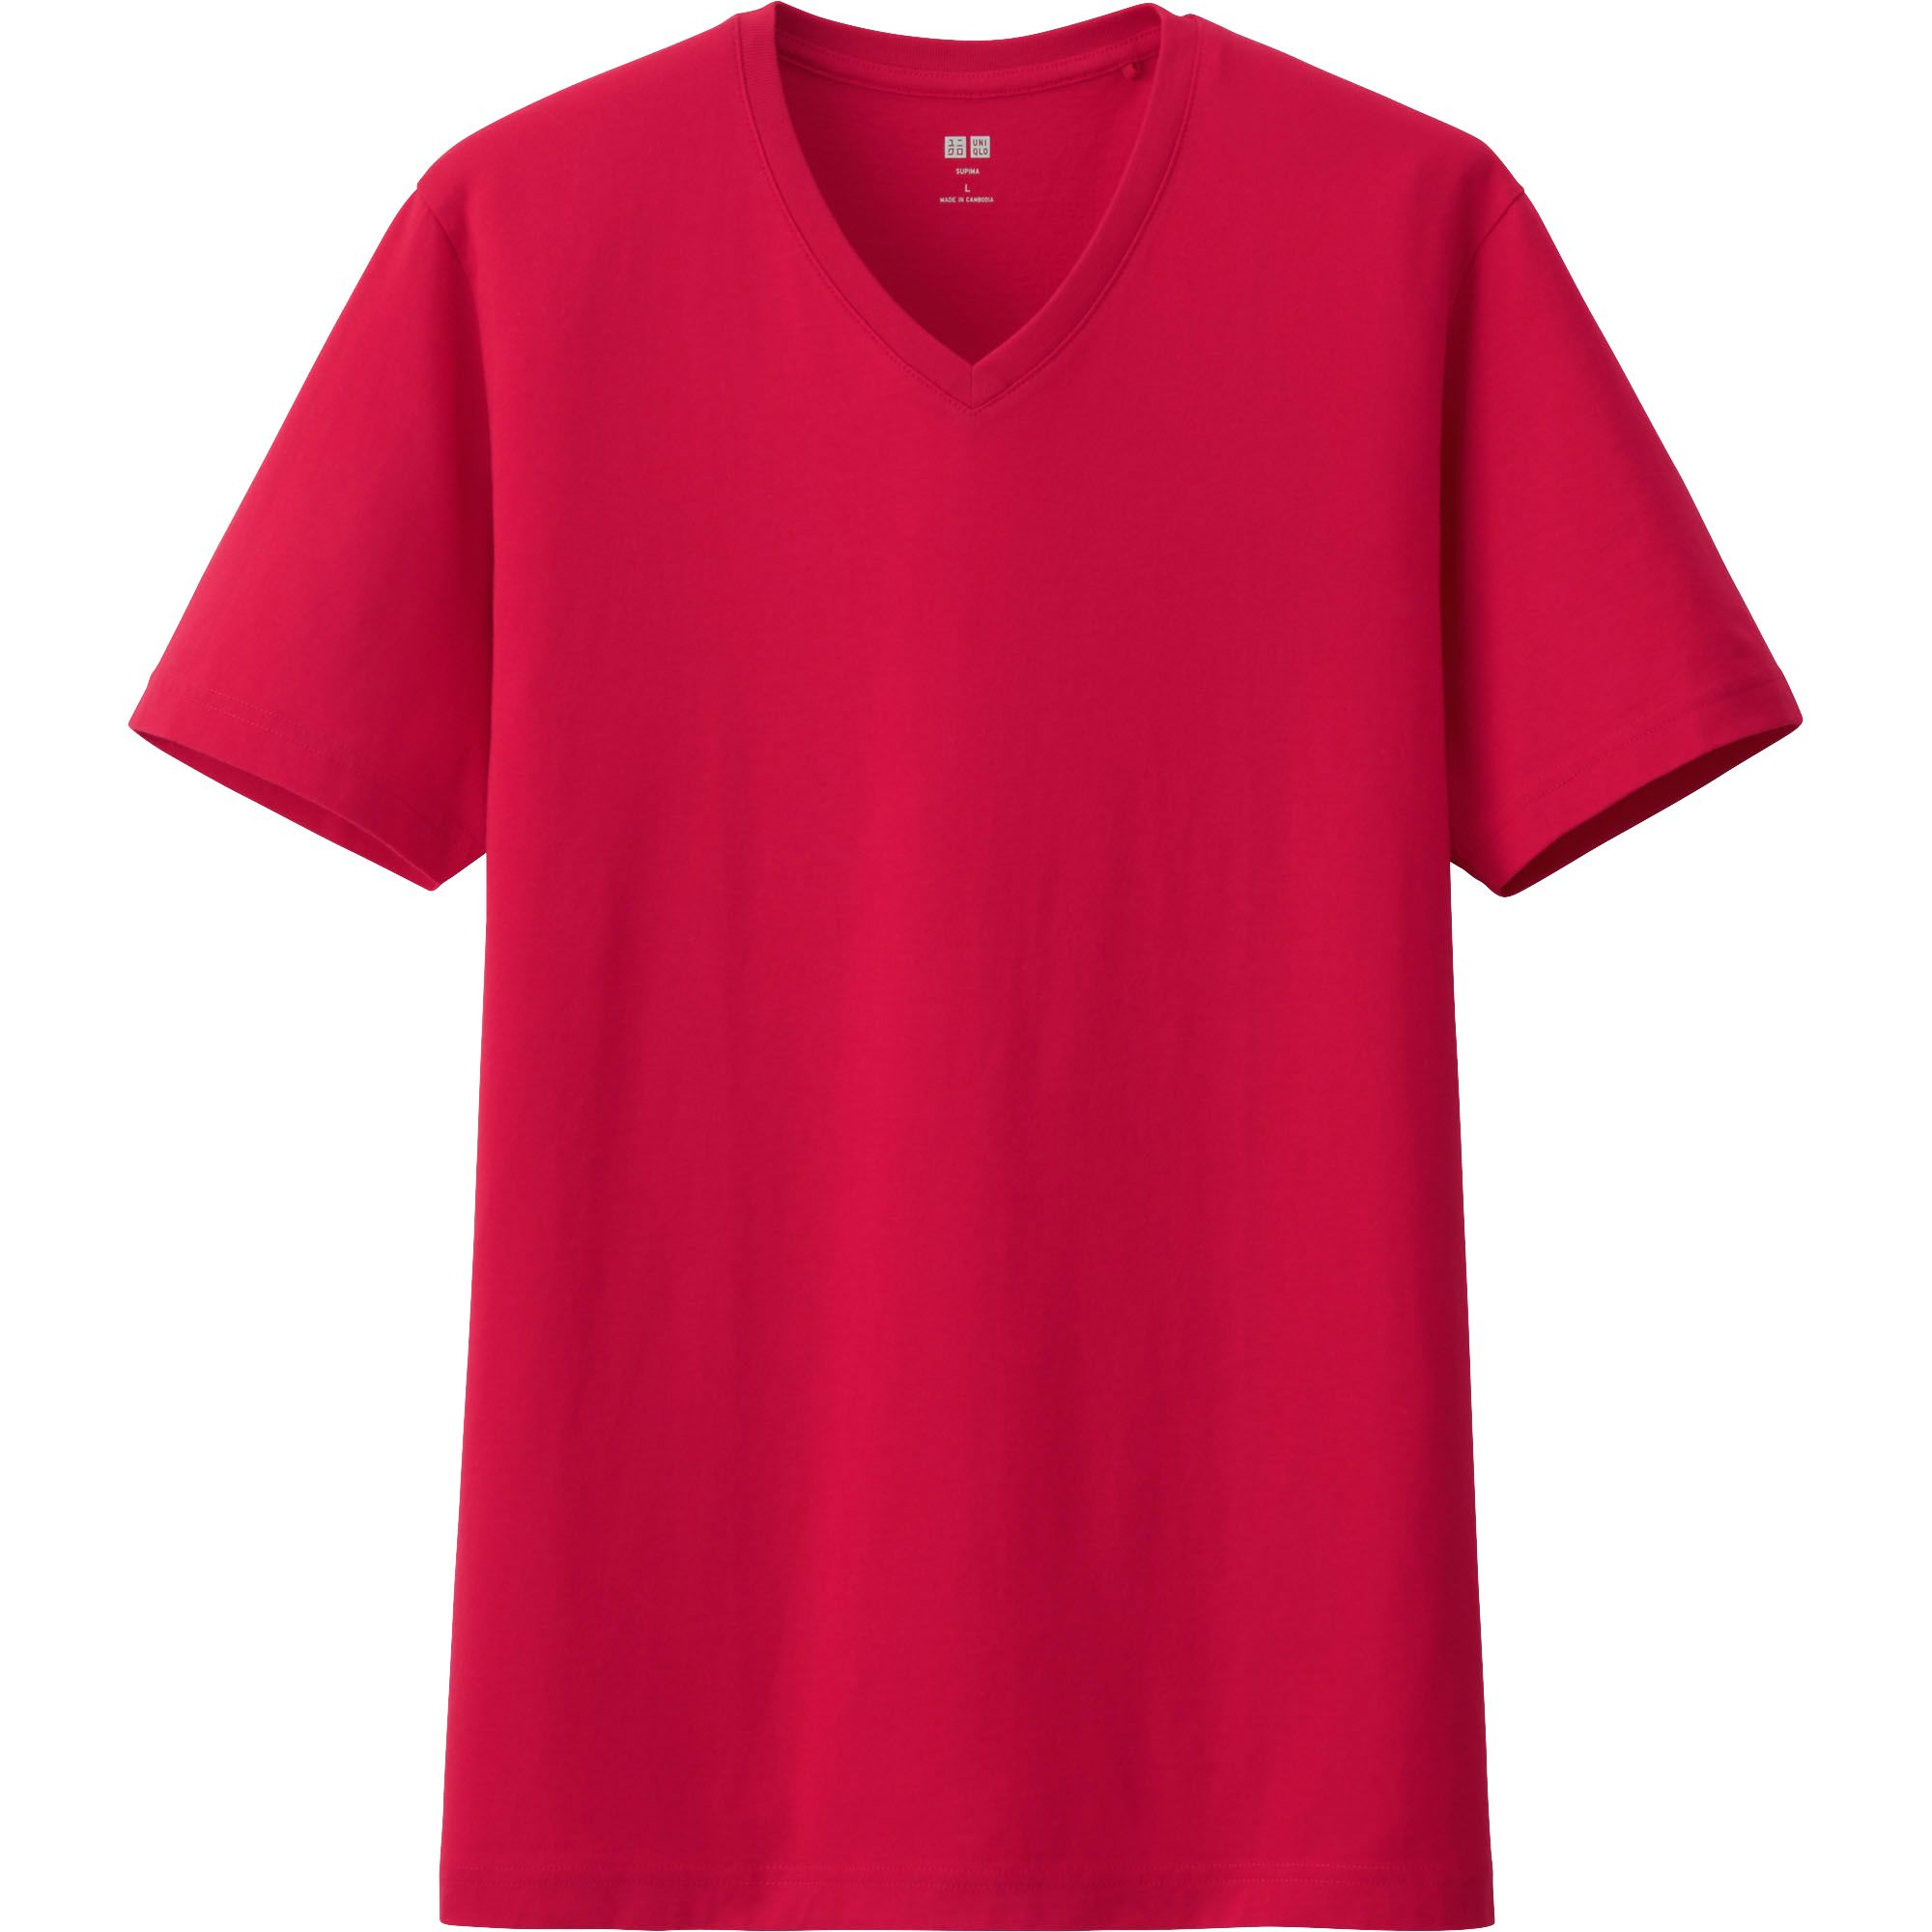 Uniqlo red men supima cotton v neck short sleeve t shirt for Supima cotton dress shirts